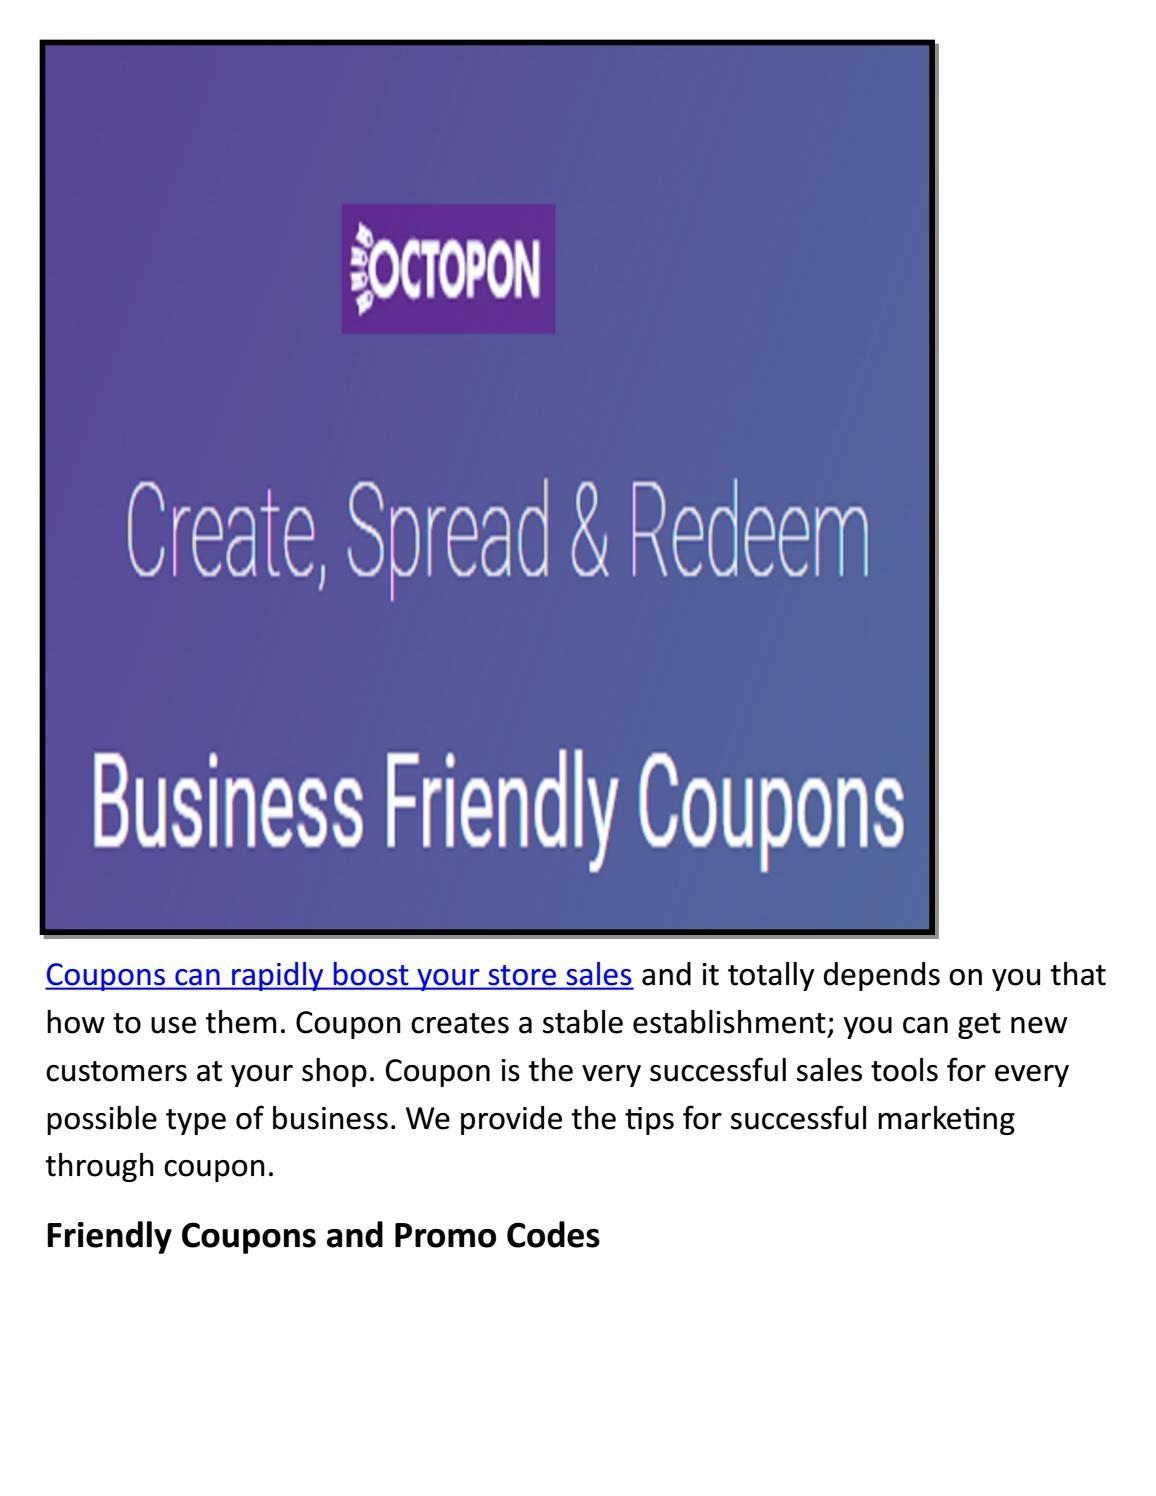 Create Your Own Coupon Free Printableoctopon Inc - Issuu - Create Your Own Coupon Free Printable